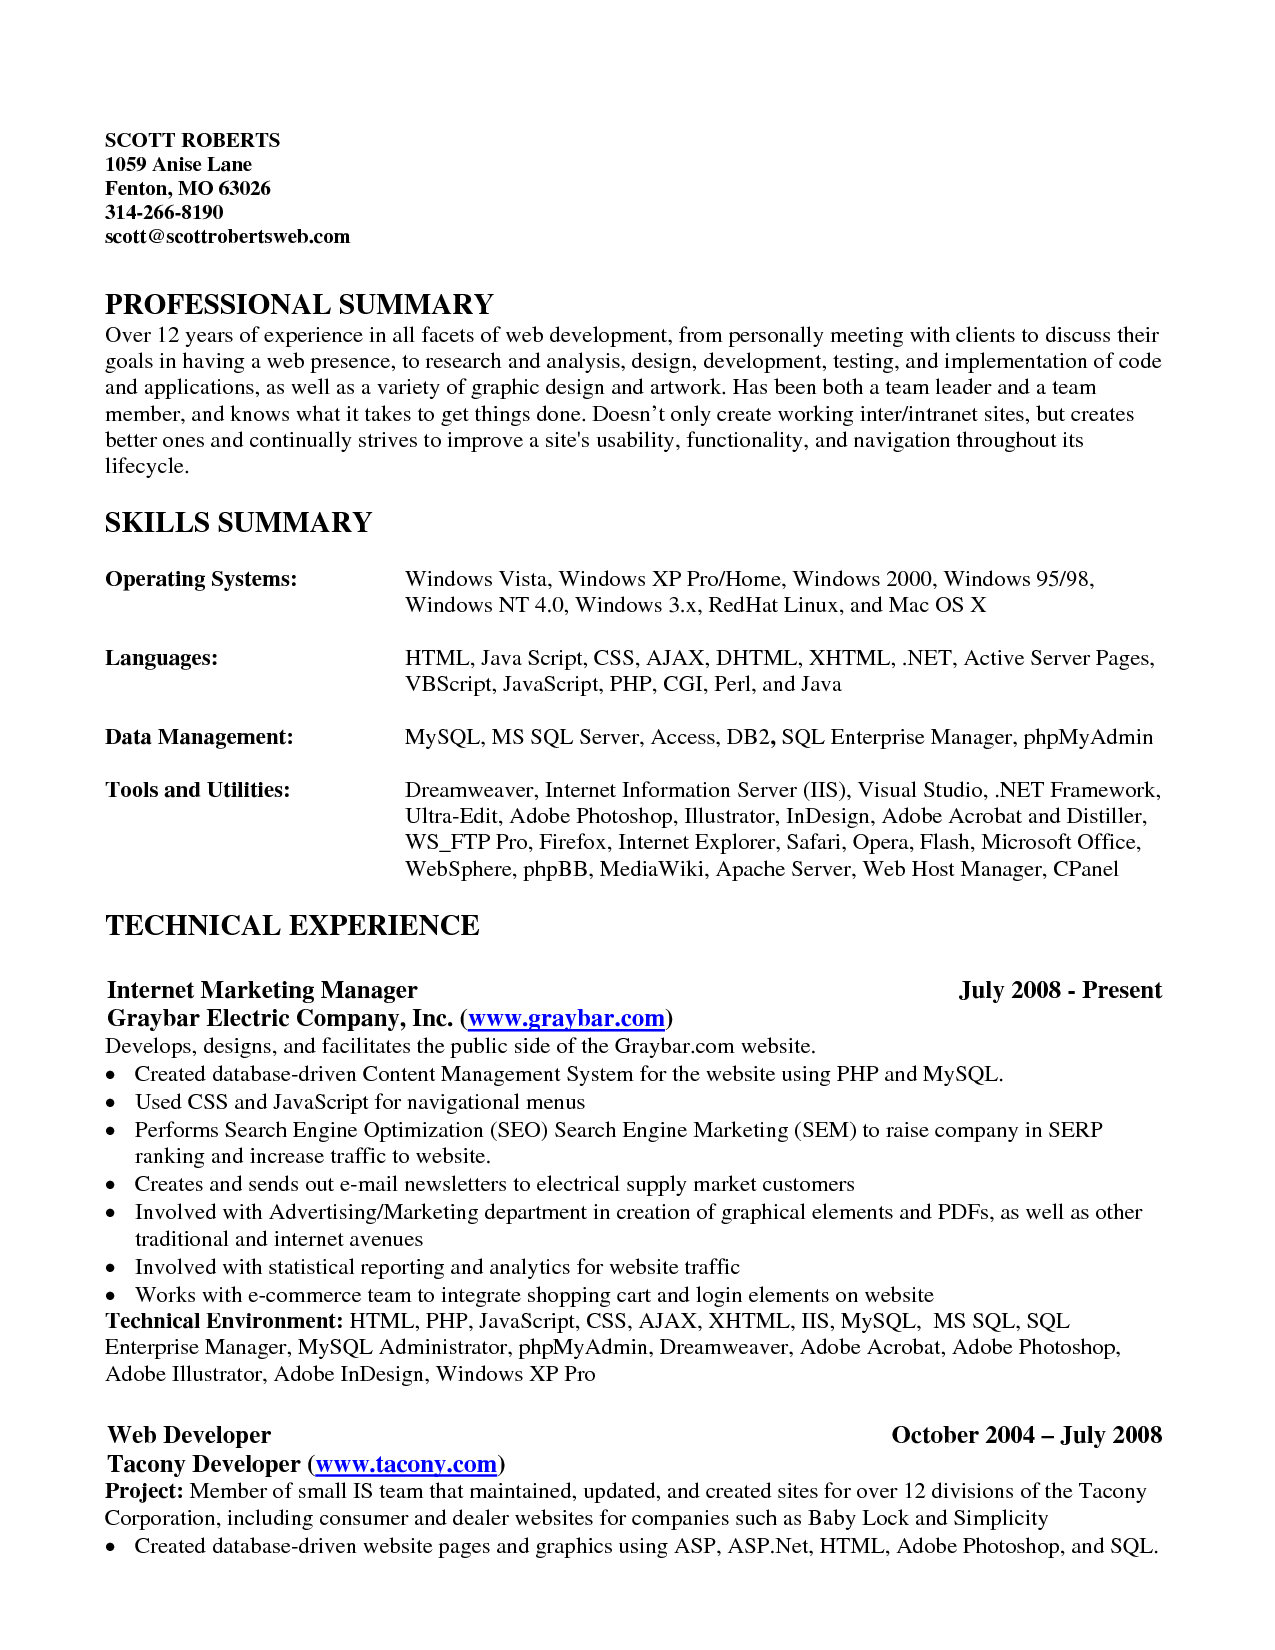 Example Of Skills Summary For Resume Resume Summary